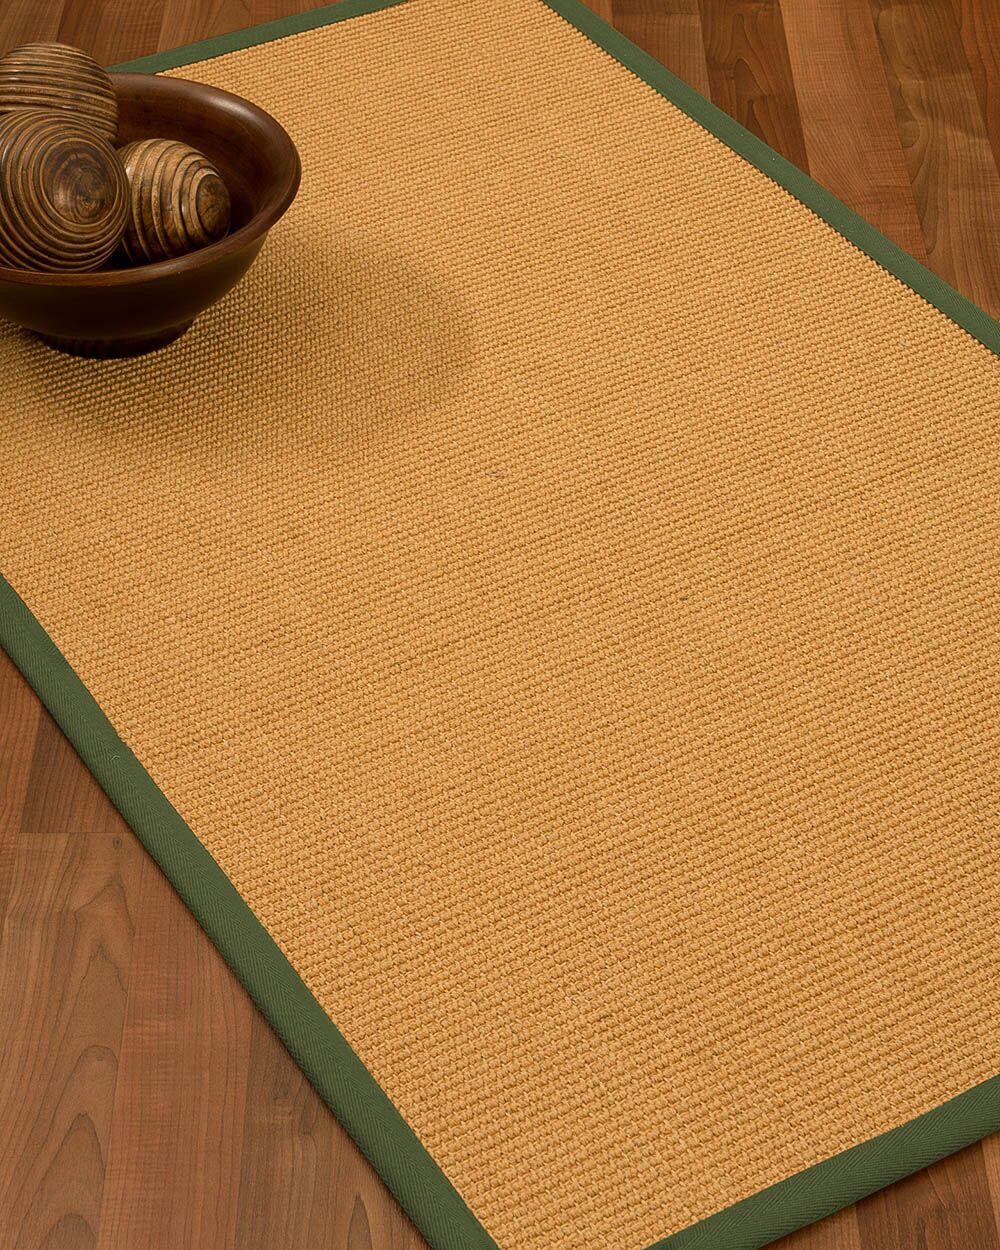 Buggs Hand Woven Brown Area Rug Rug Size: Rectangle 9' X 12'